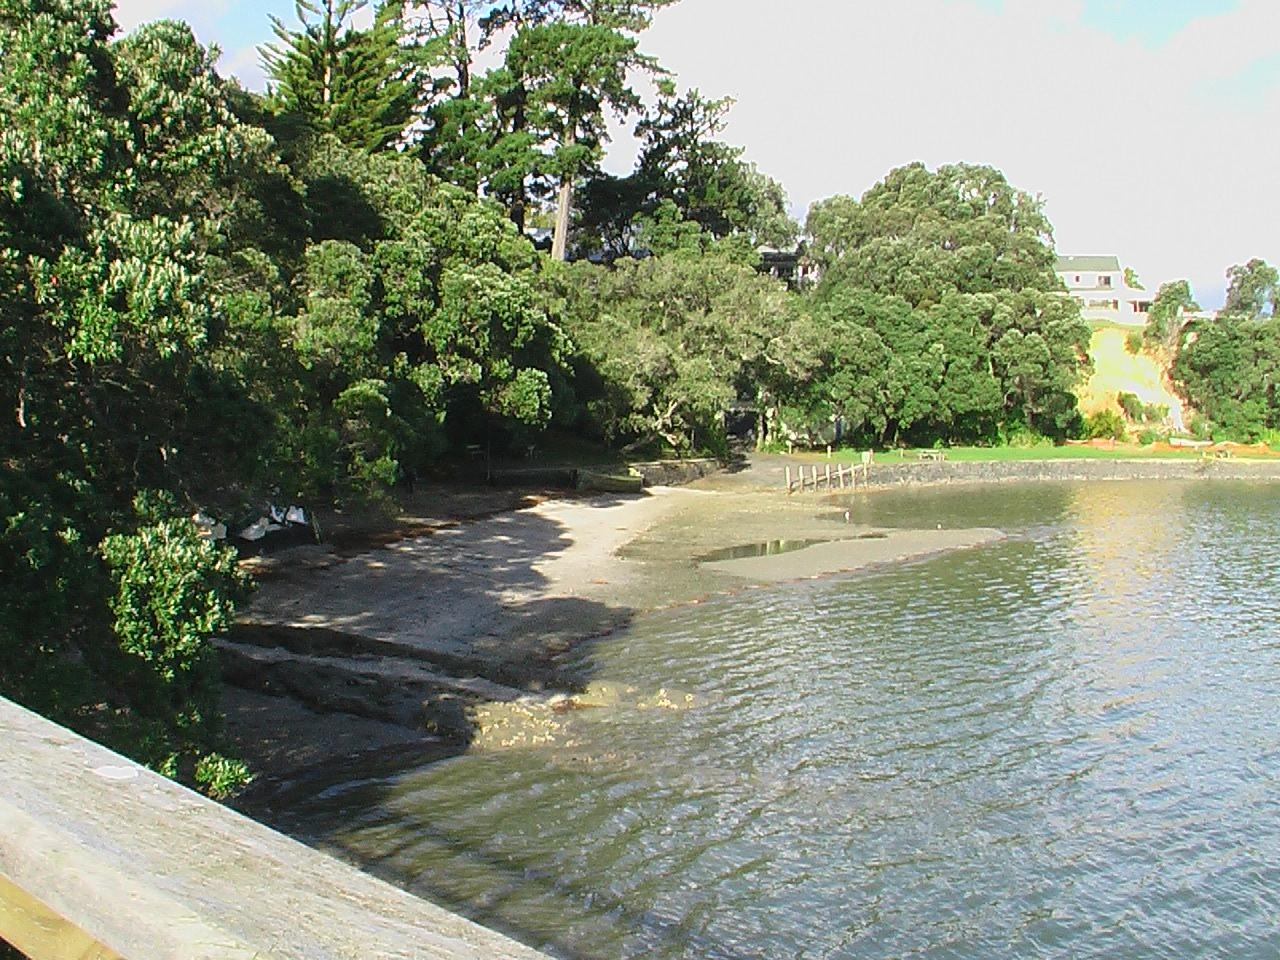 beach haven, new zealand - wikipedia